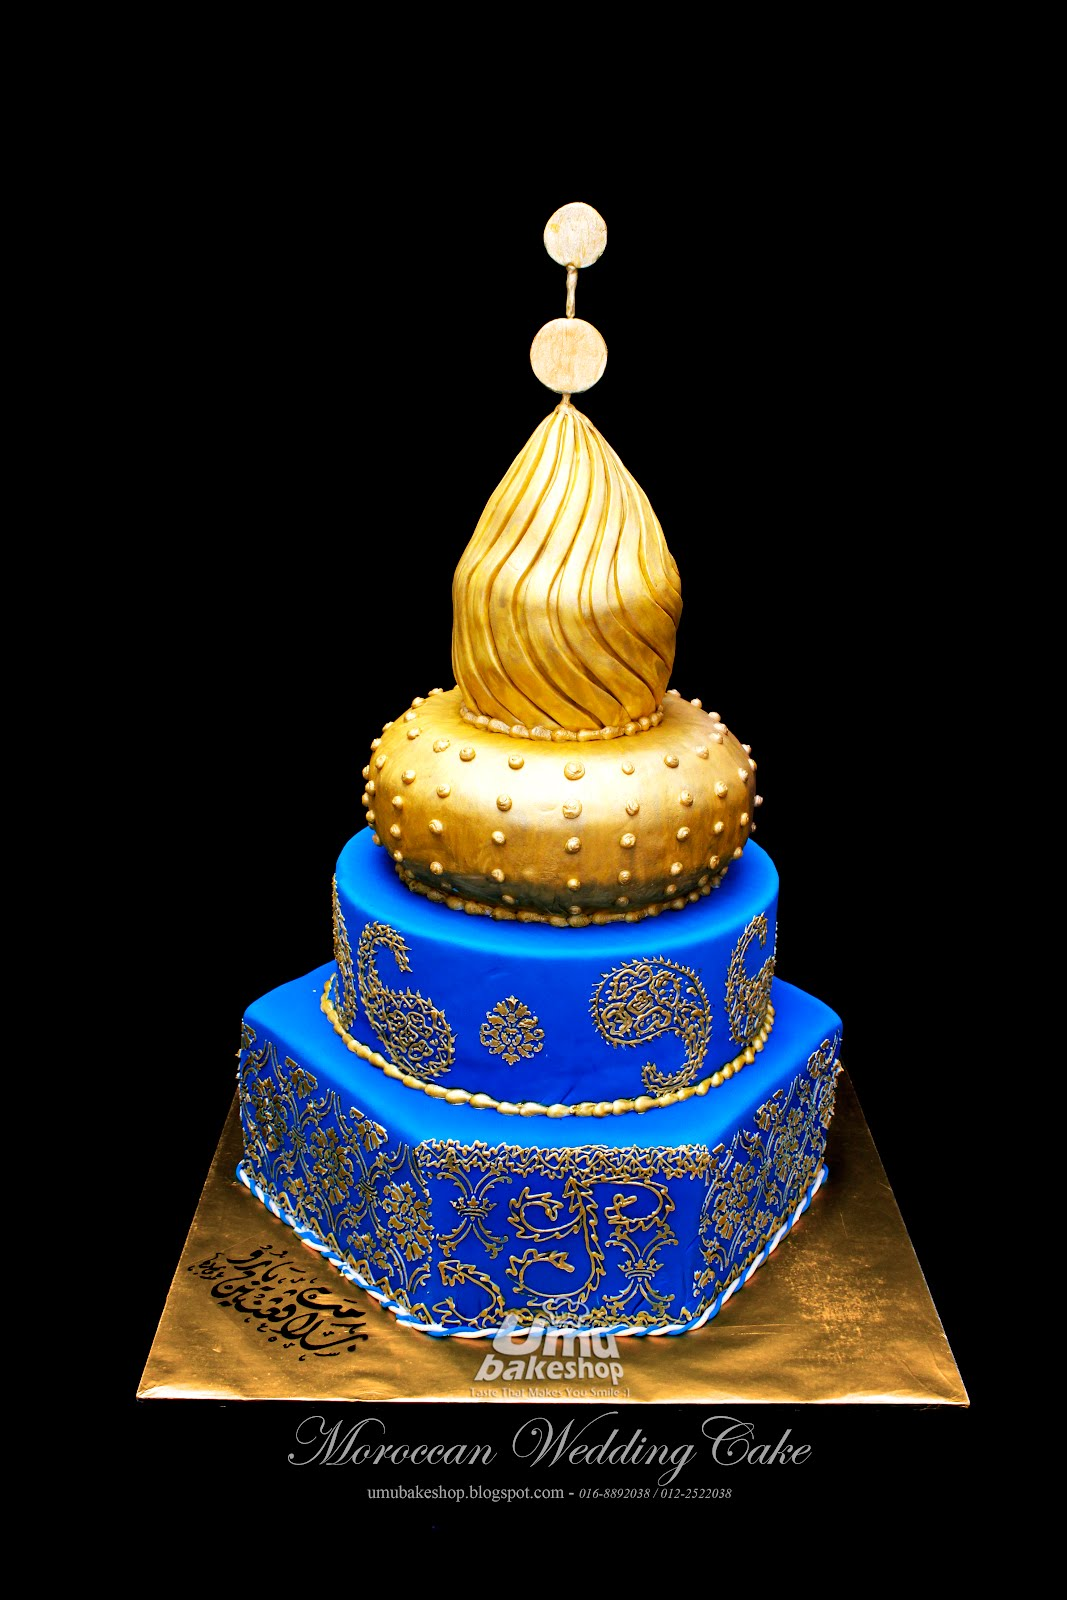 Moroccan wedding fondant cake umu bake shop for Arabian cake decoration